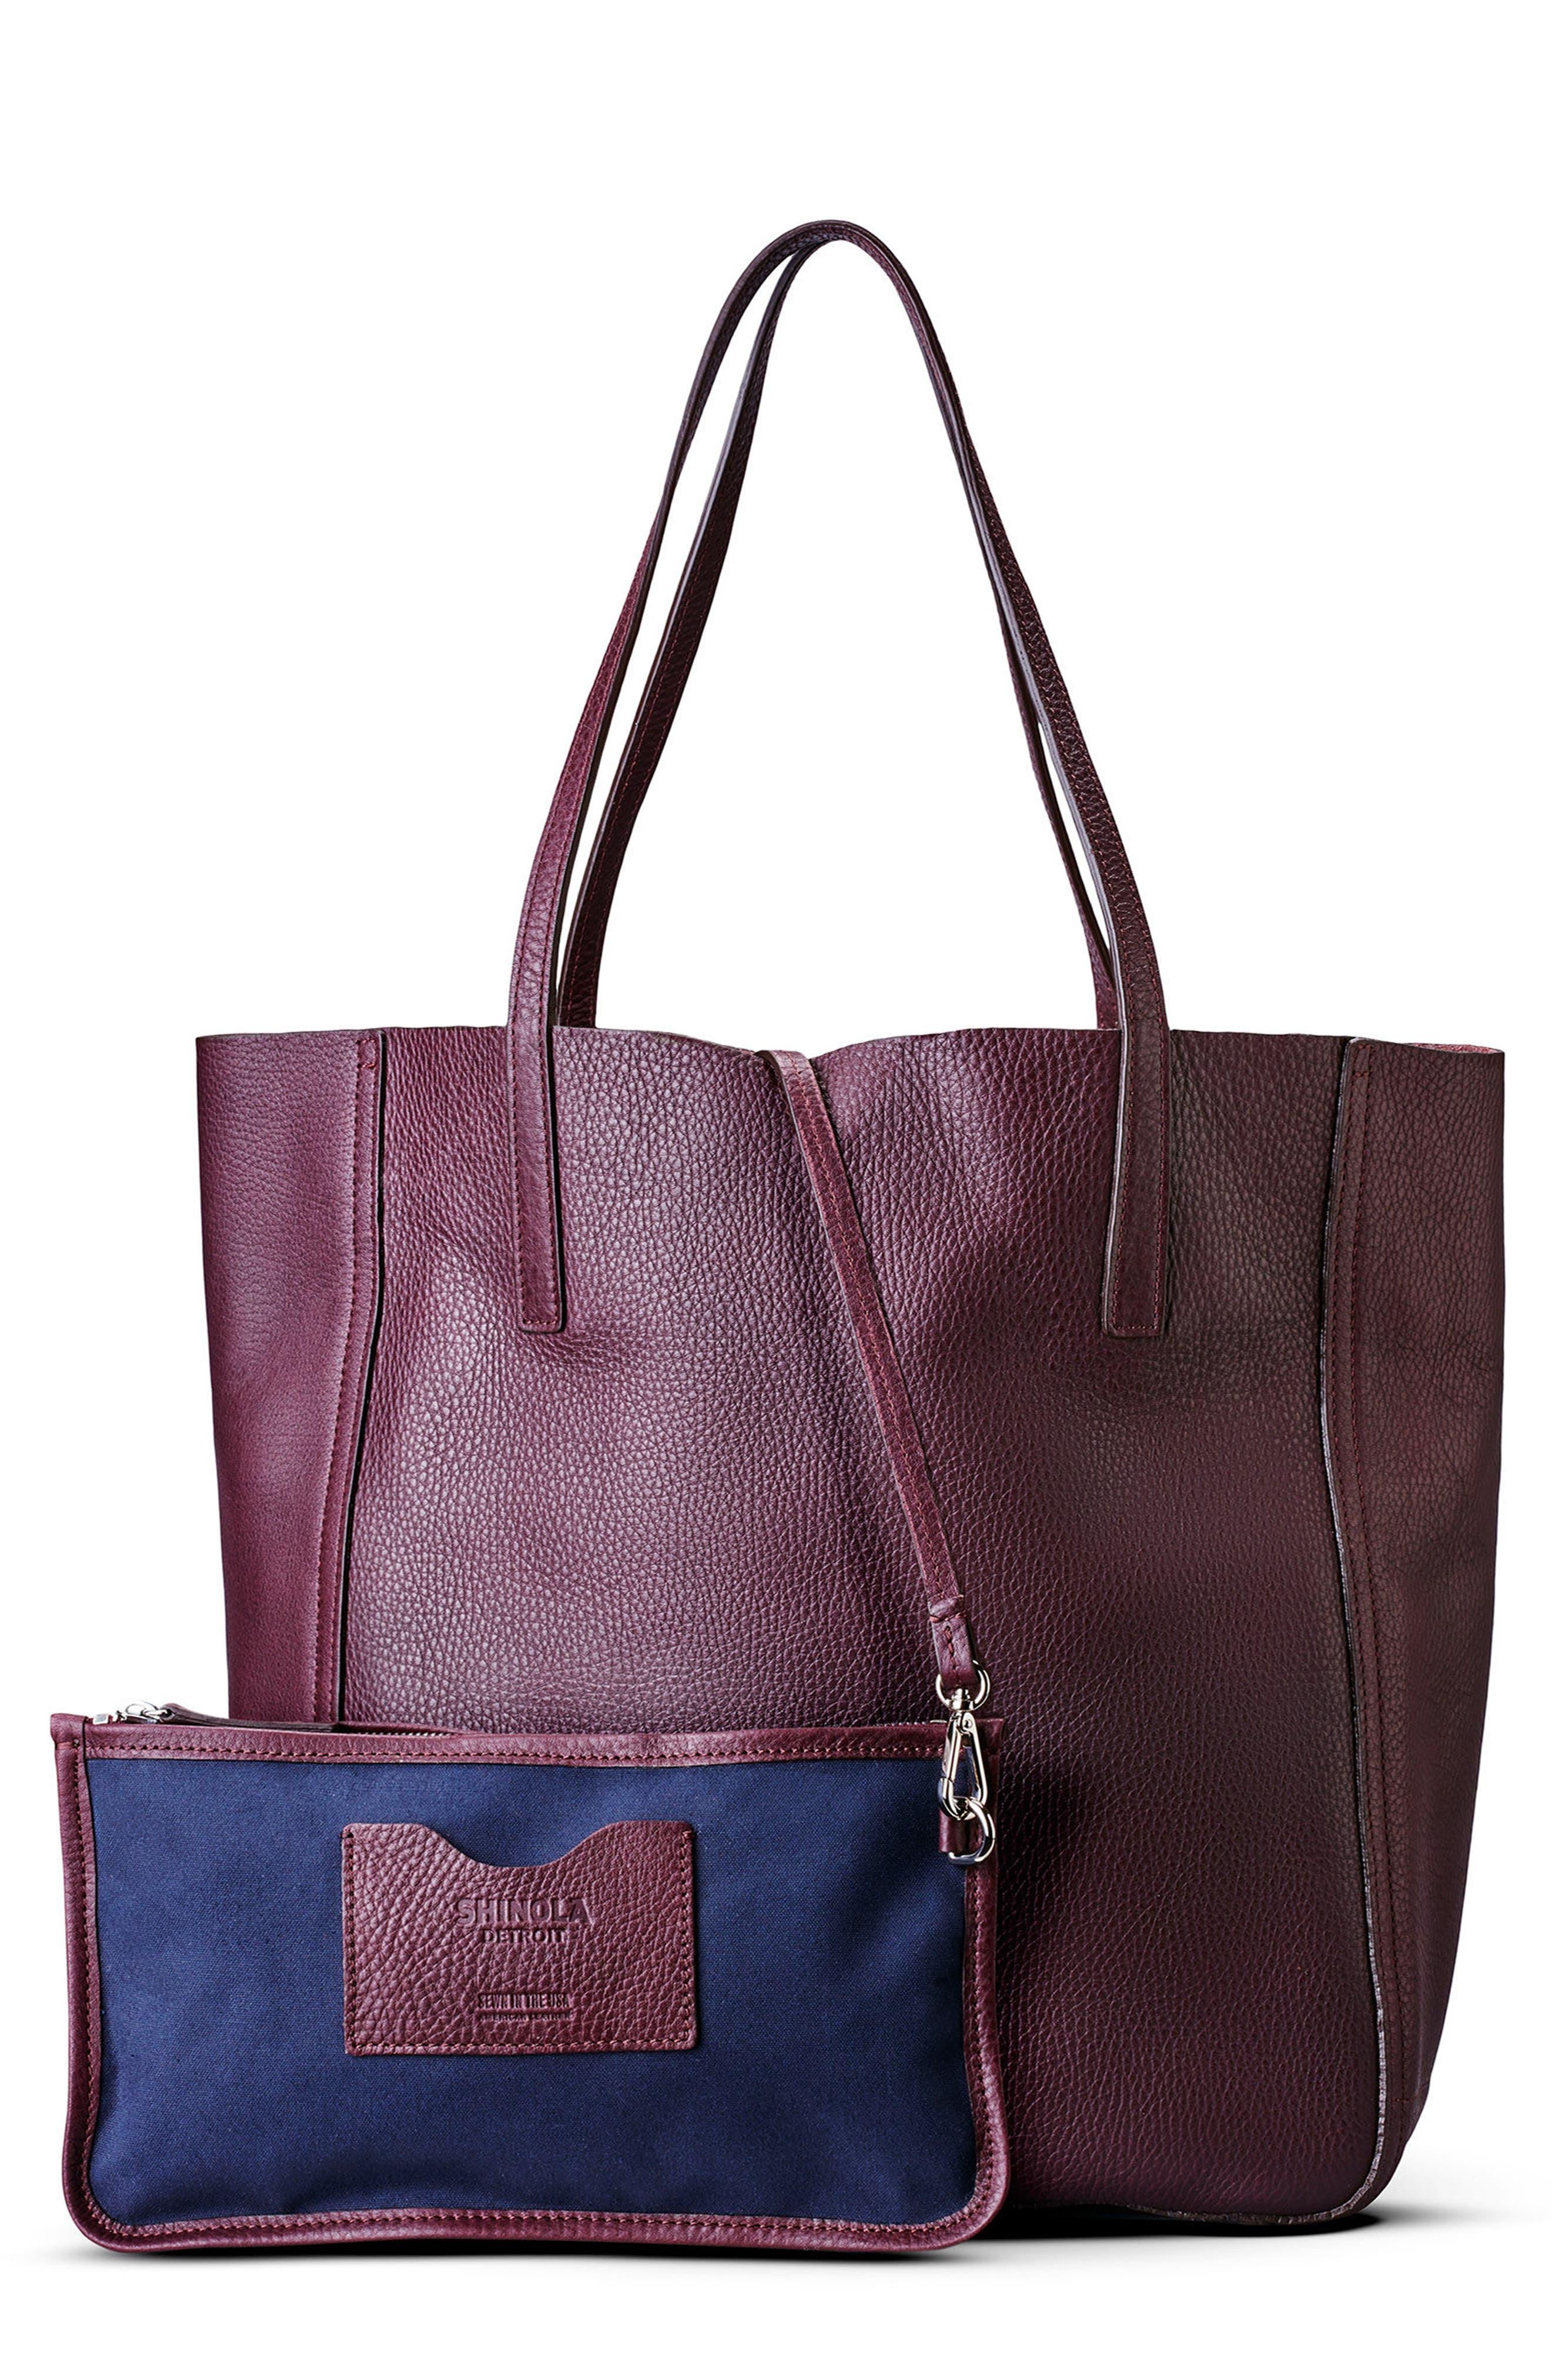 Shinola Medium Leather Shopper (Nordstrom Exclusive)